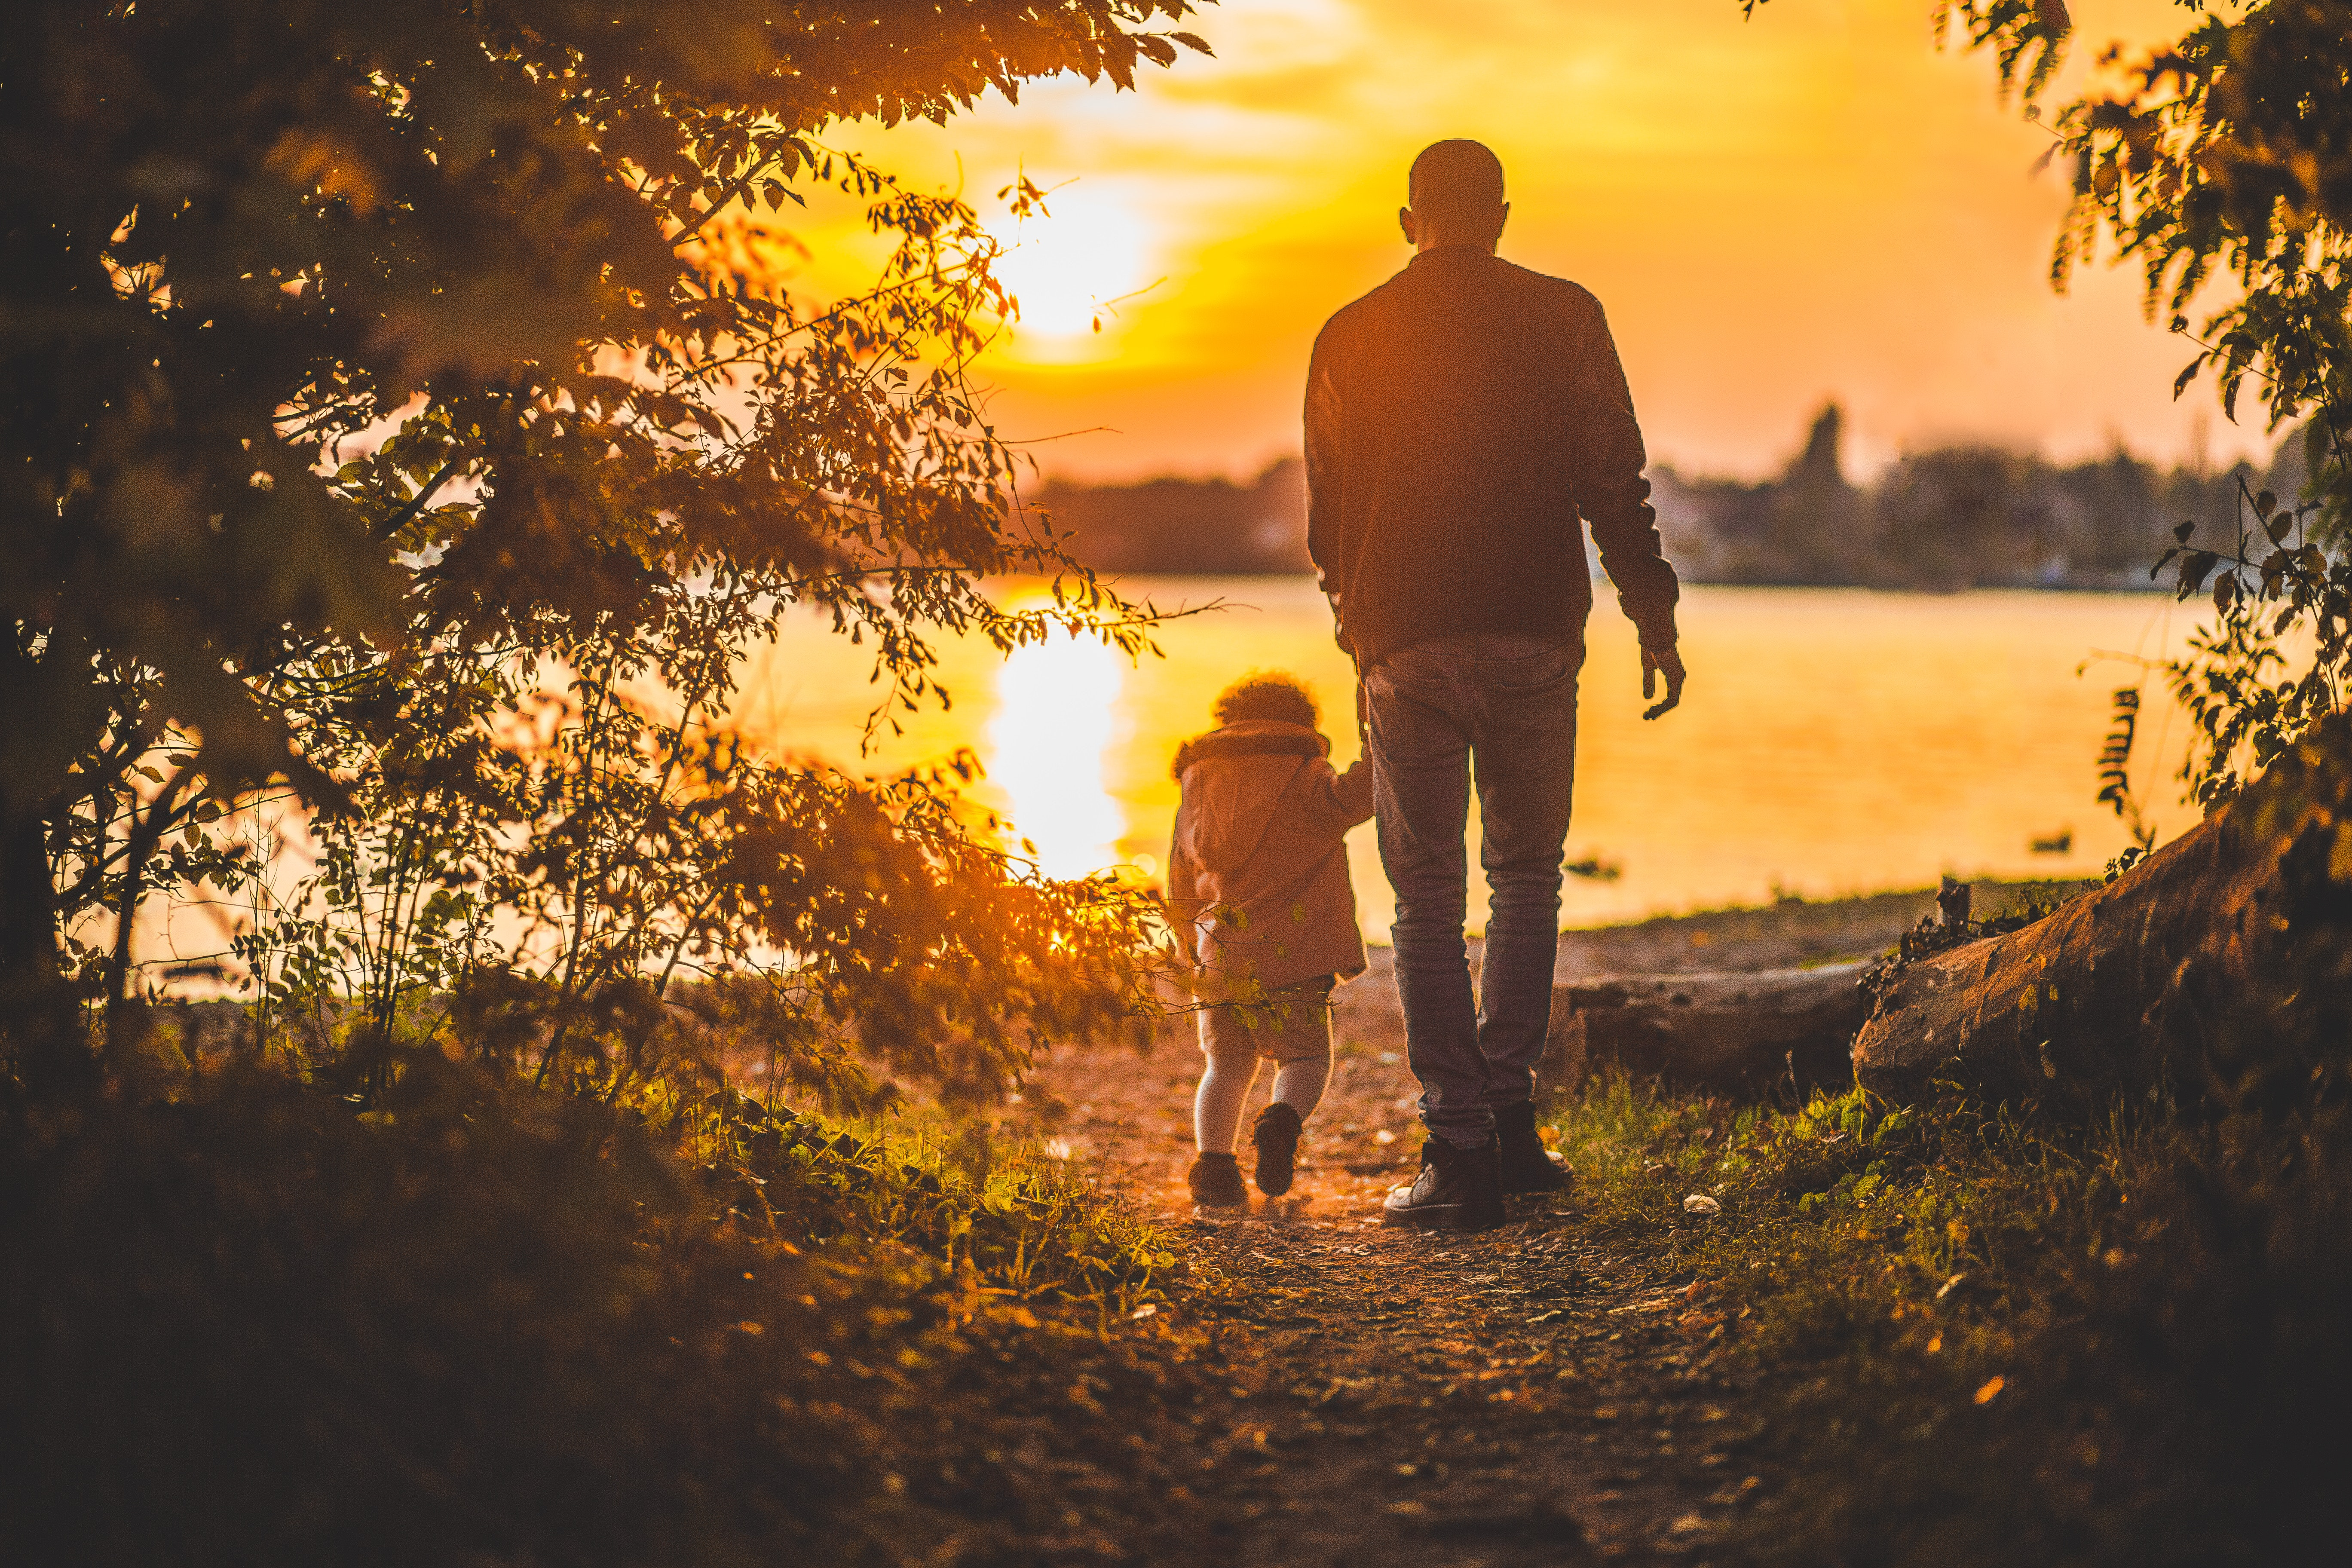 Behind Me, My Father – Suhanee Ranjan